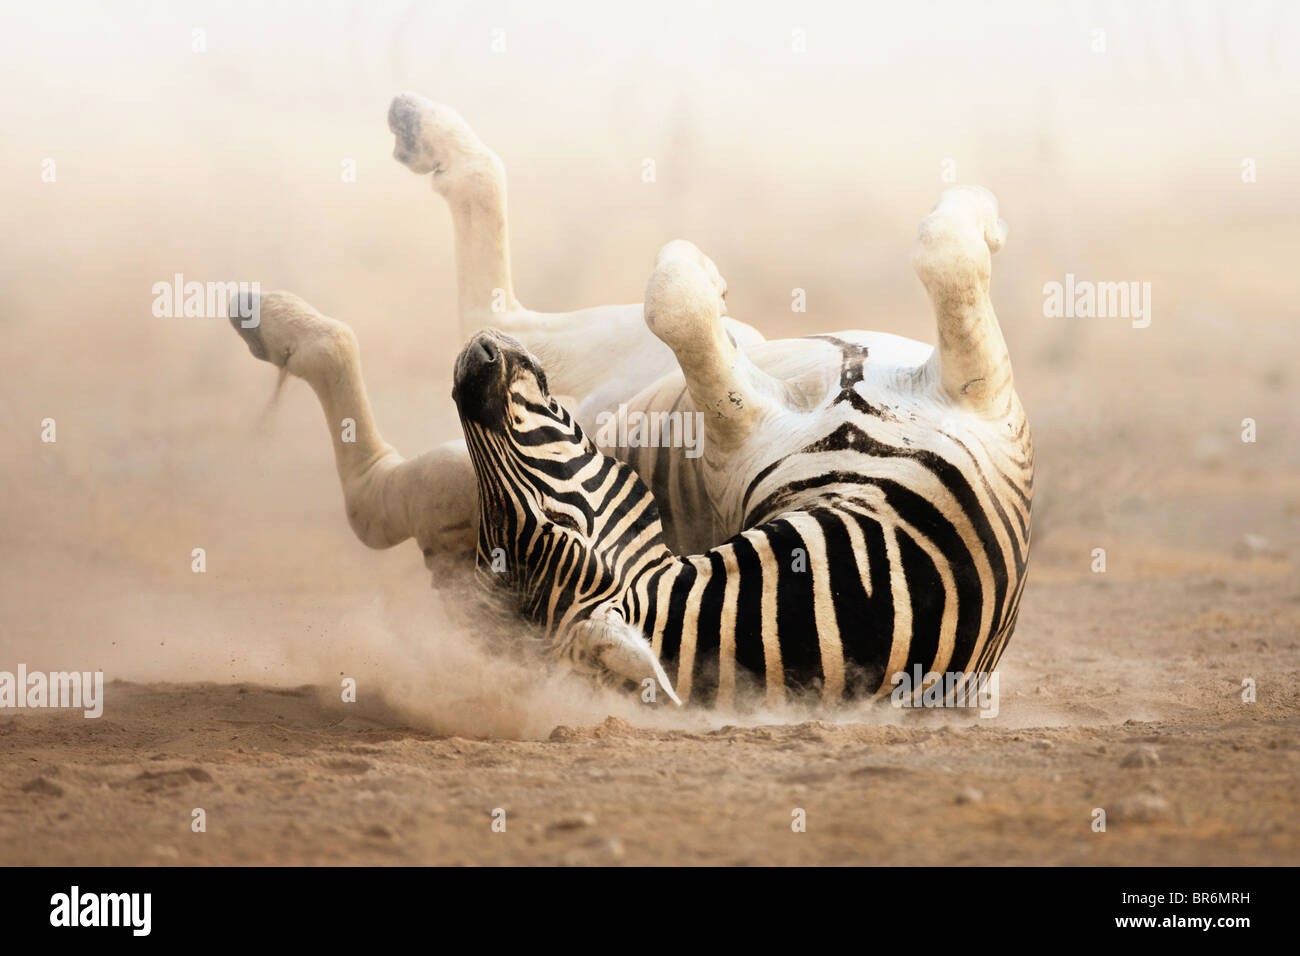 Zebra rolling on dusty sand in the early morning ; Etosha - Stock Image